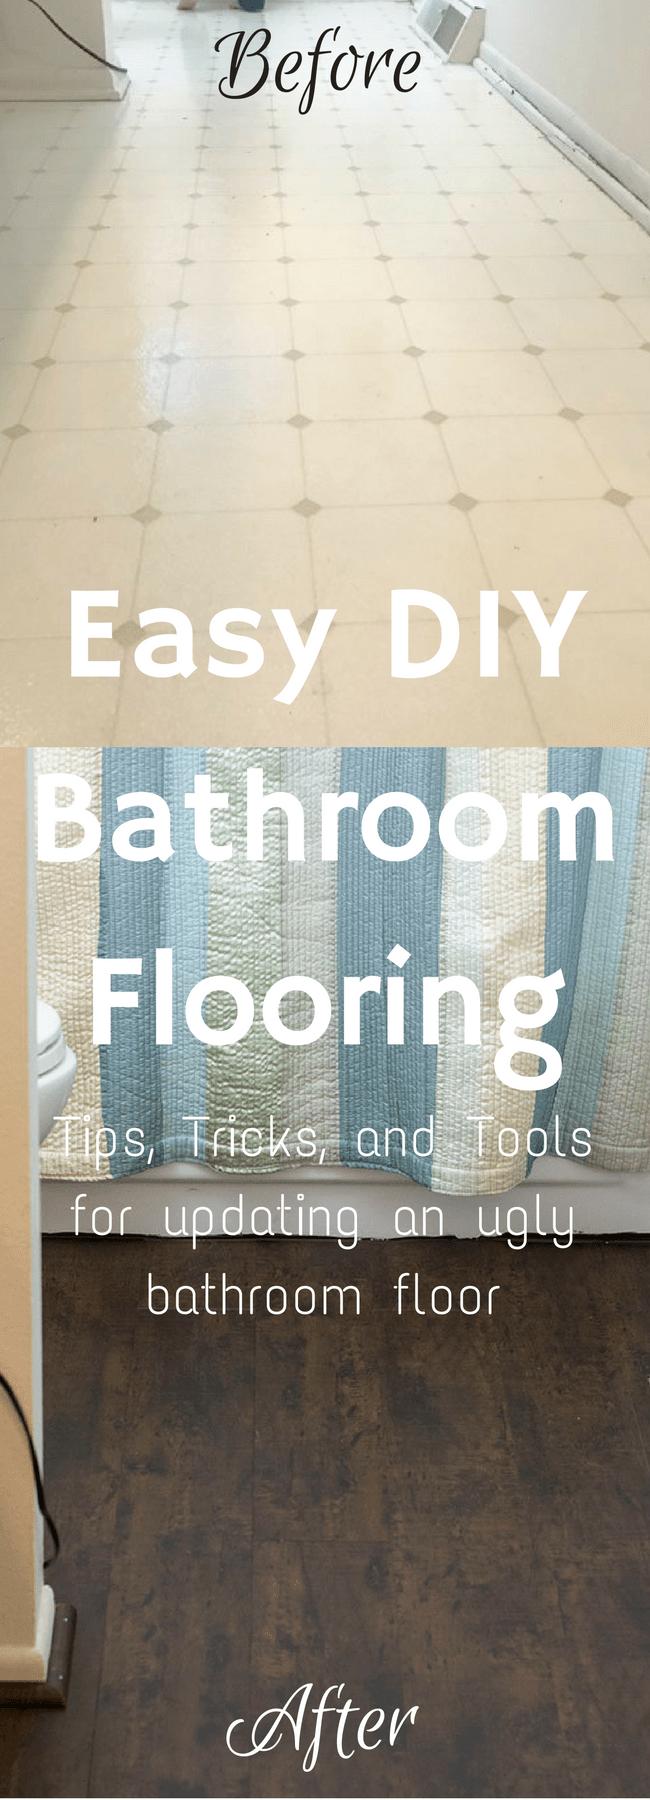 Bathroom Remodel / Bathroom Ideas / Bathroom on a Budget / Bathroom Makeover / Flooring Ideas / Floor DIY / Floor Ideas / Cheap Floor